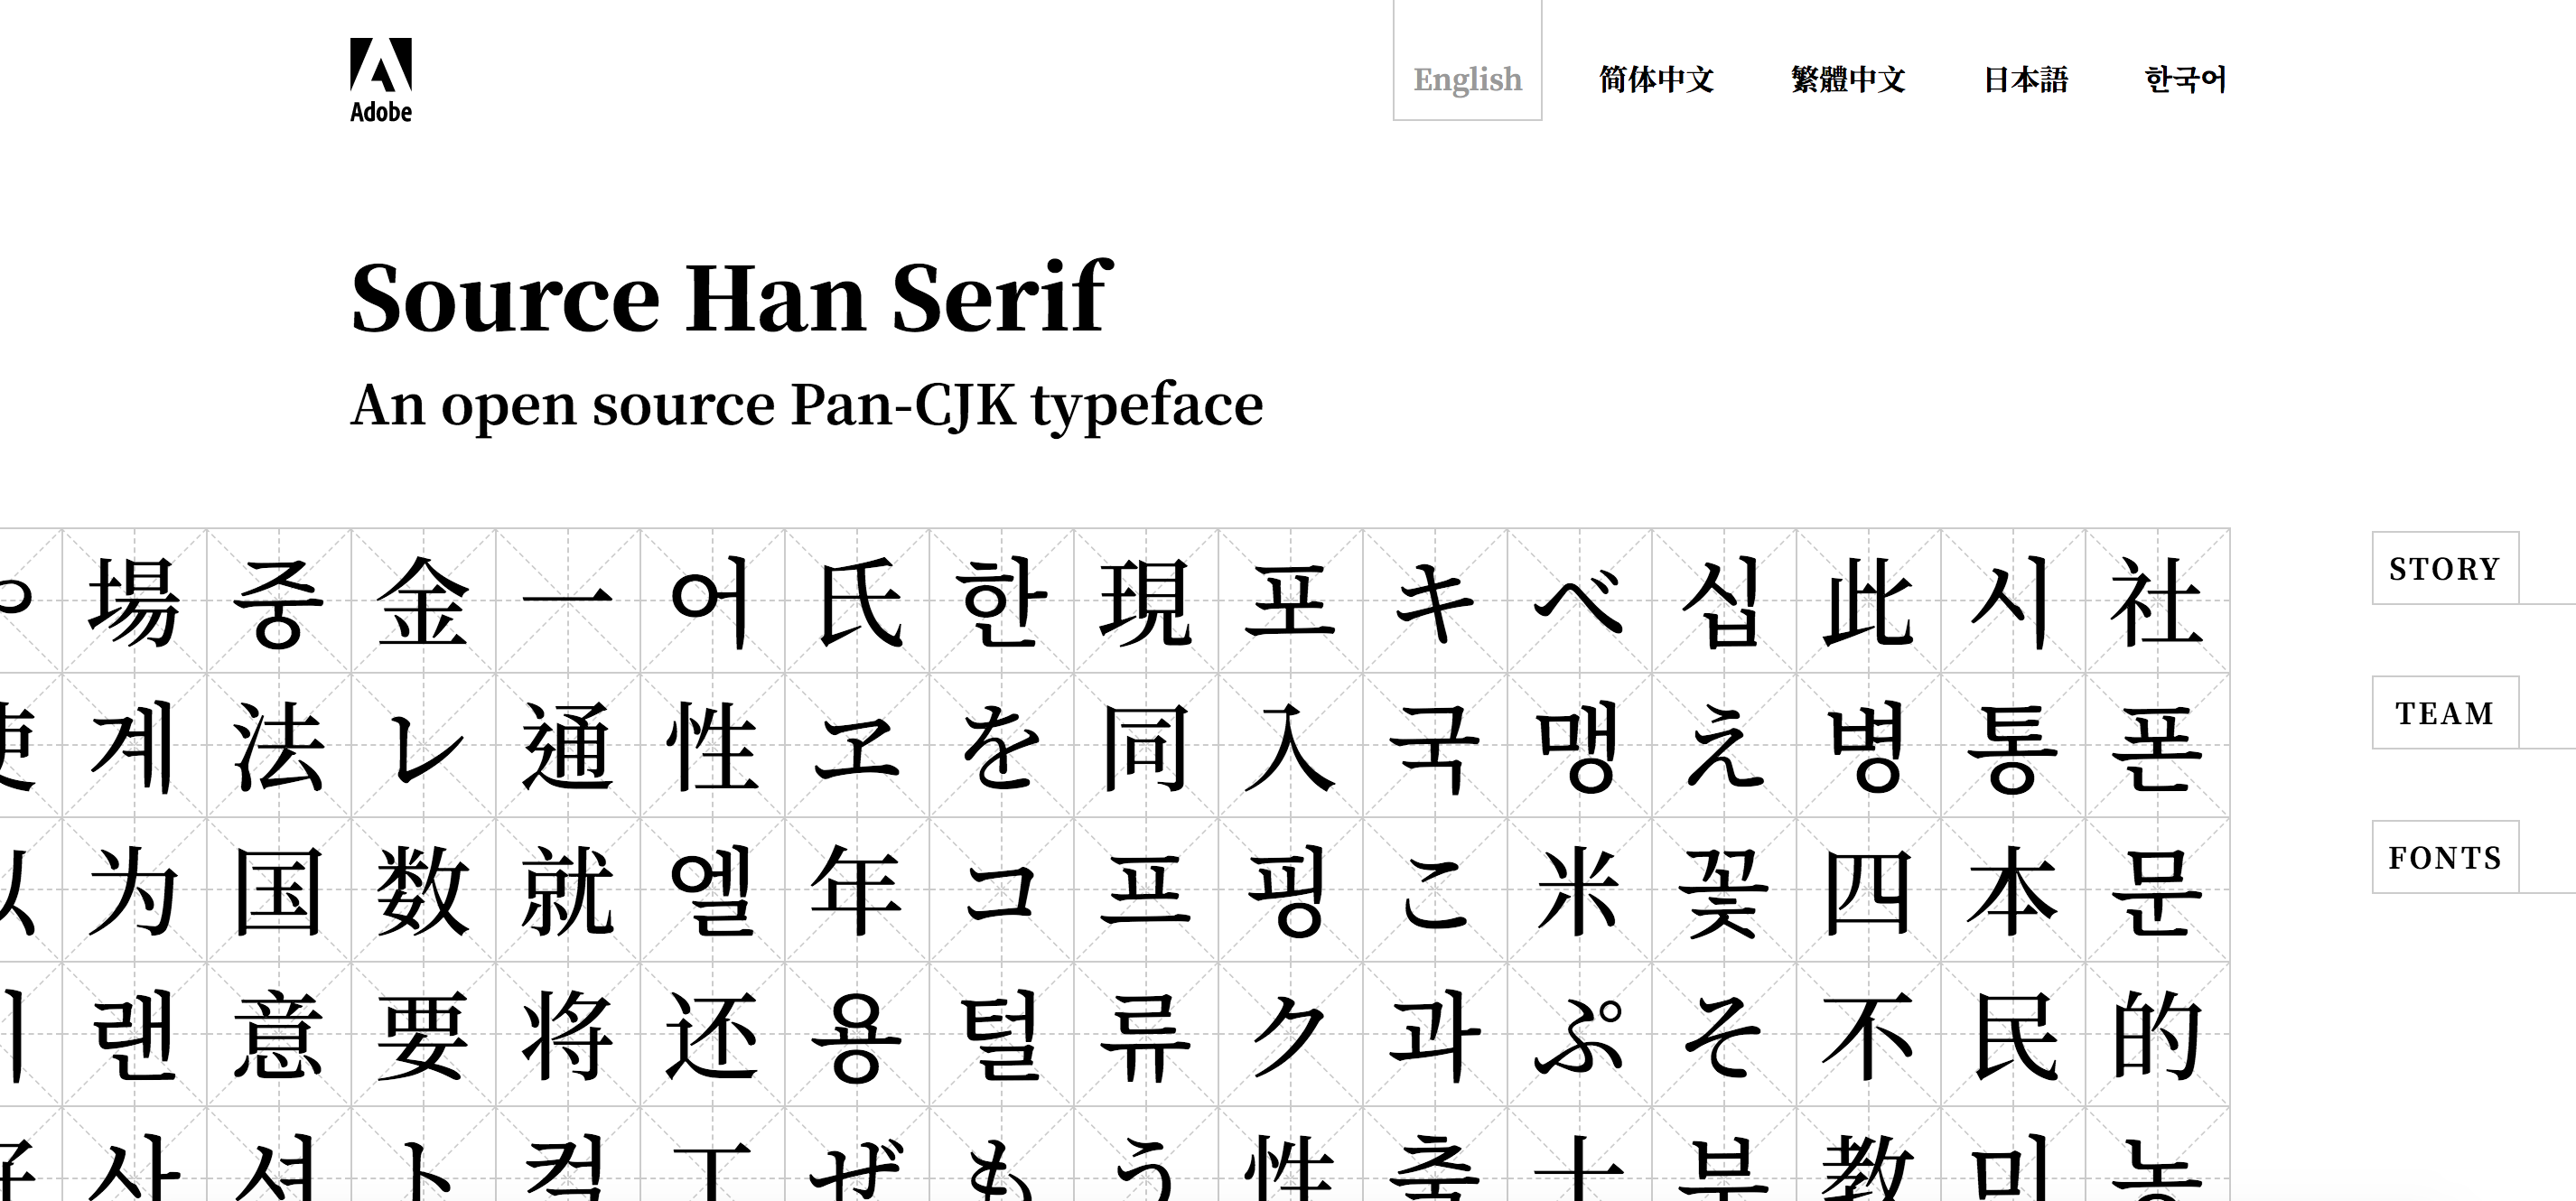 Source Han Serif website